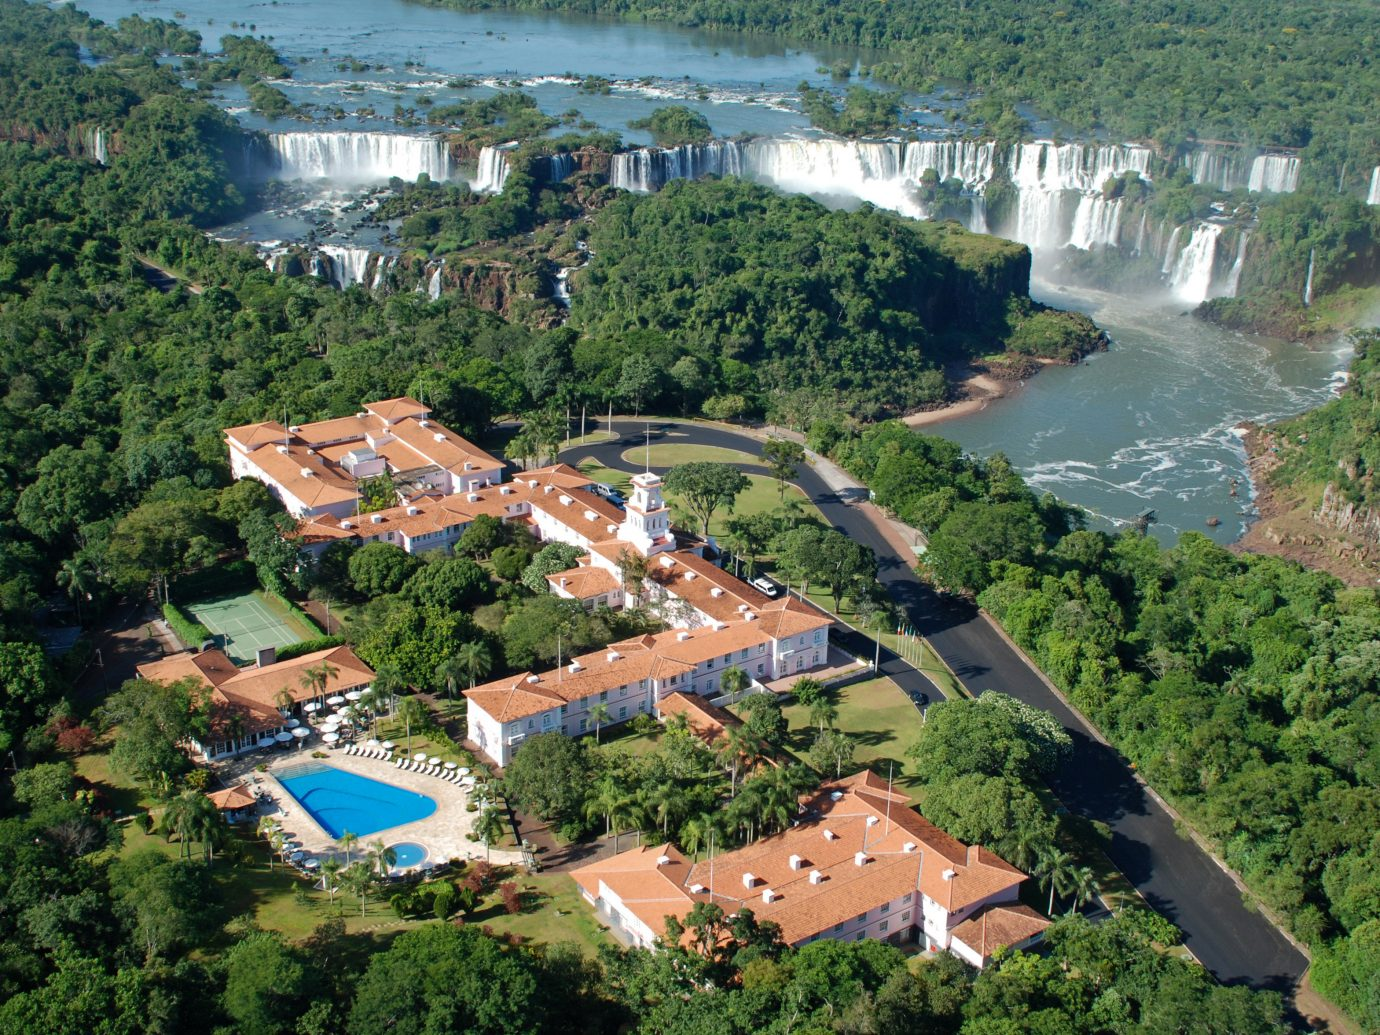 Aerial view of Belmond Hotel das Cataratas